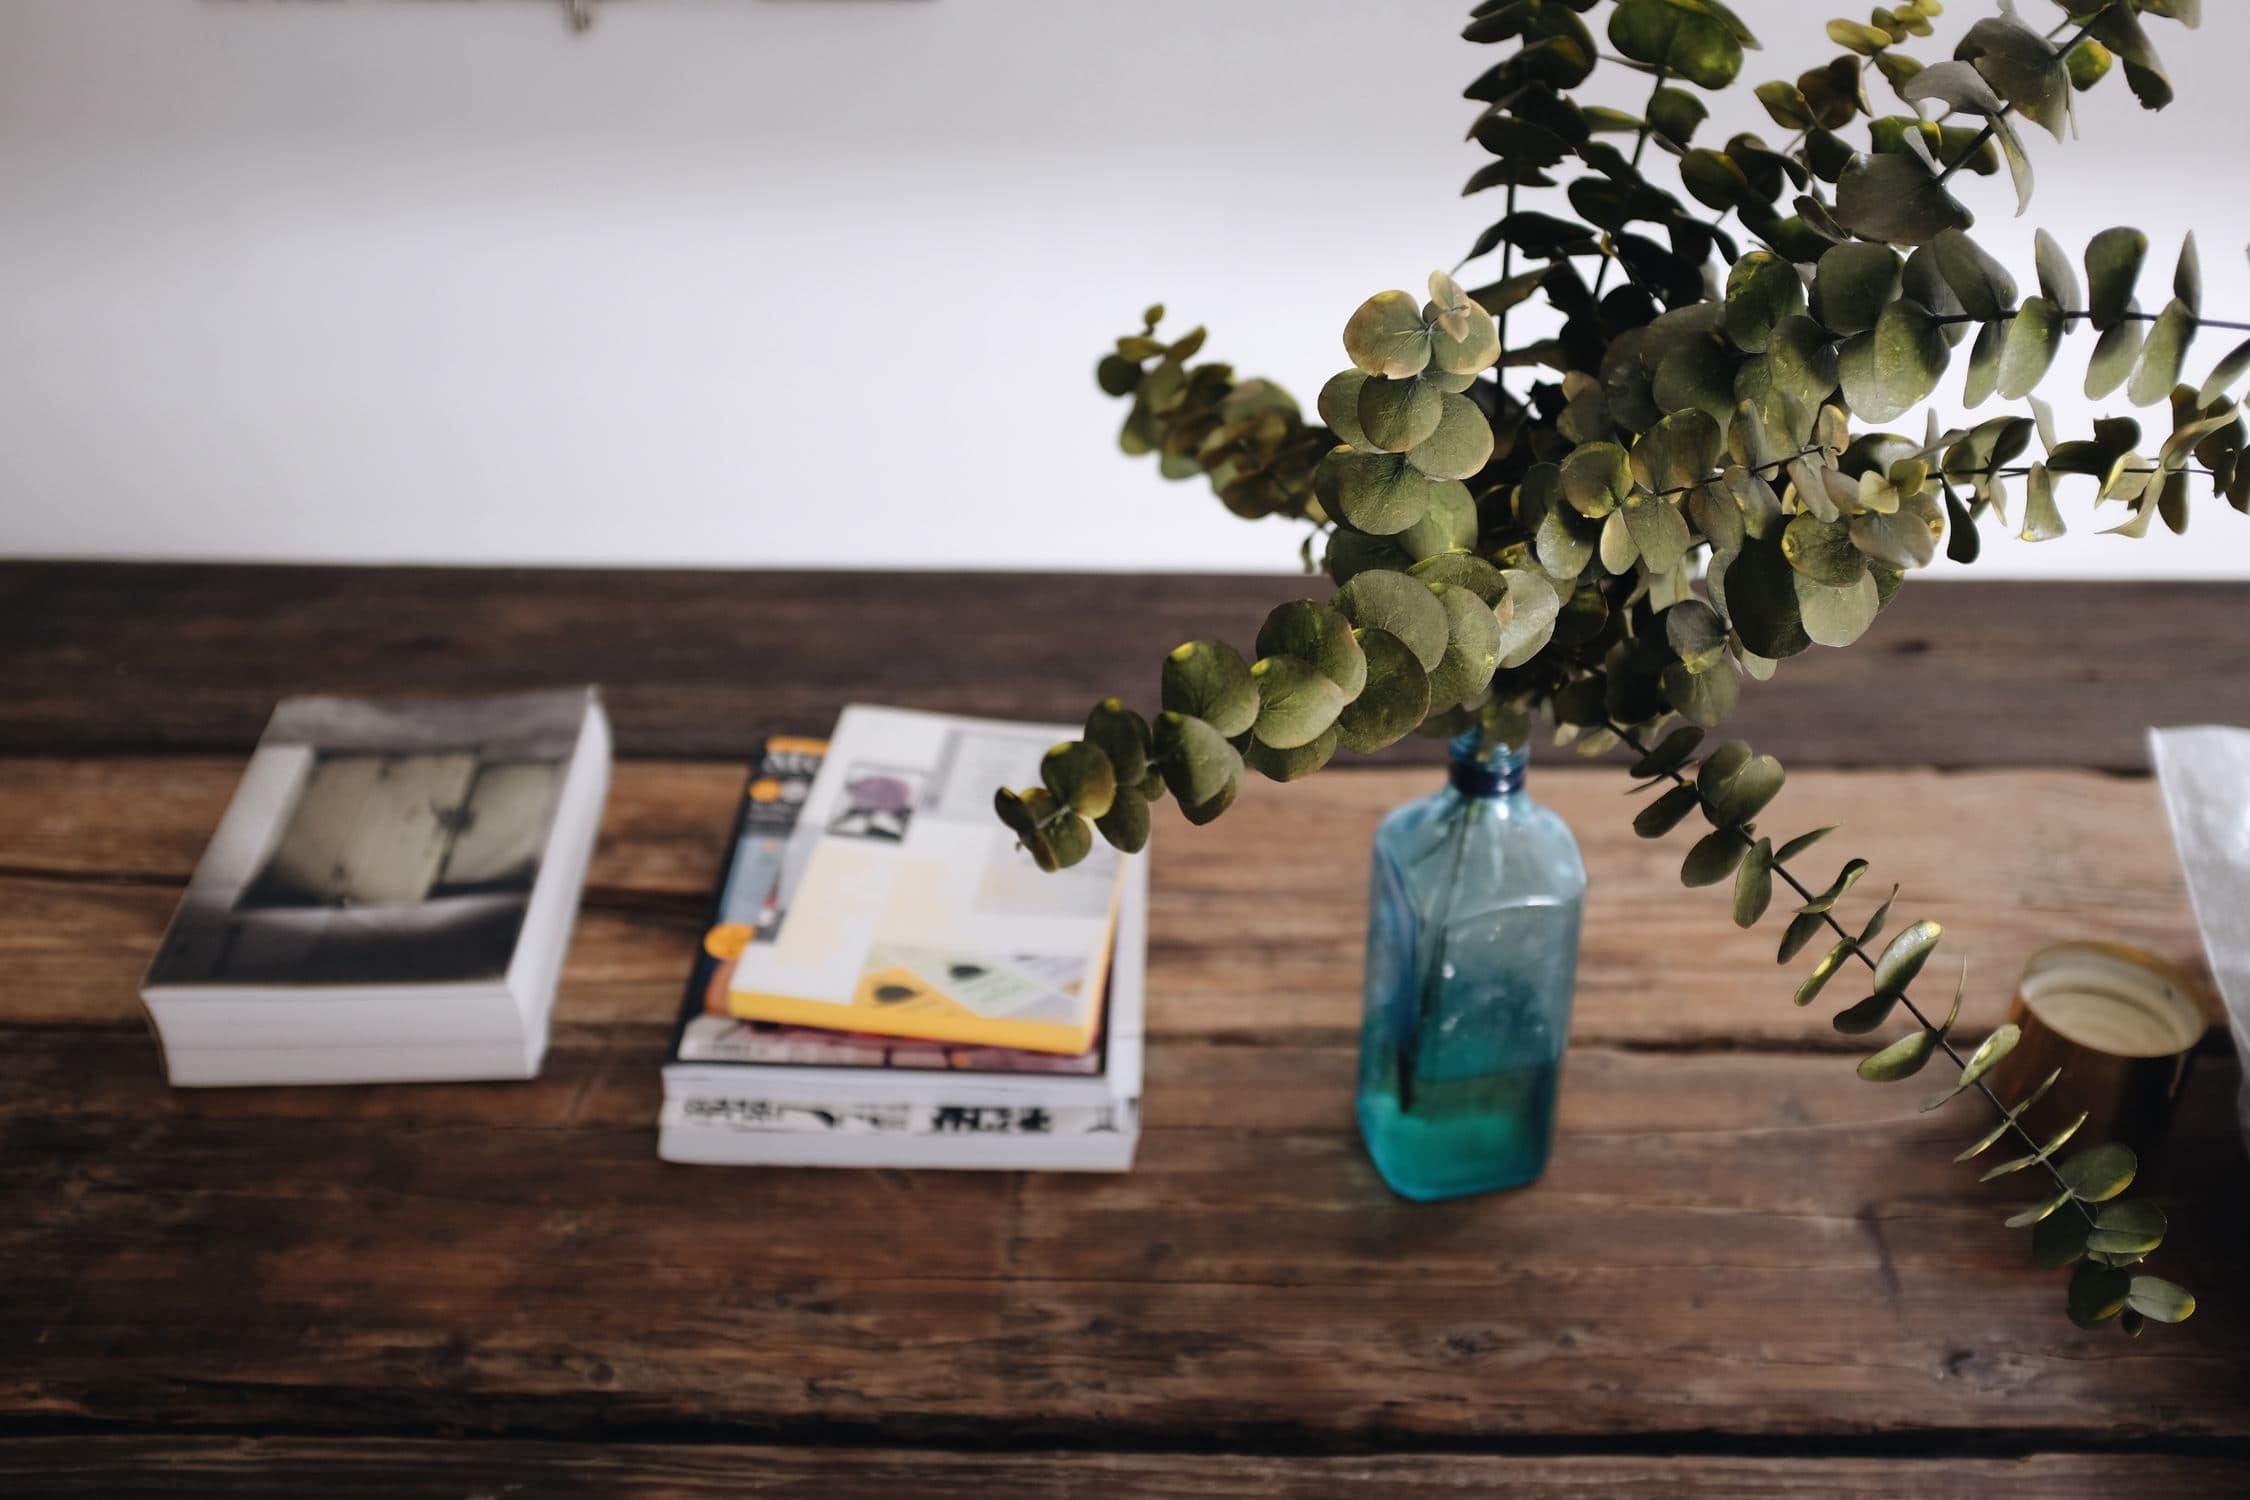 drzewko na biurku